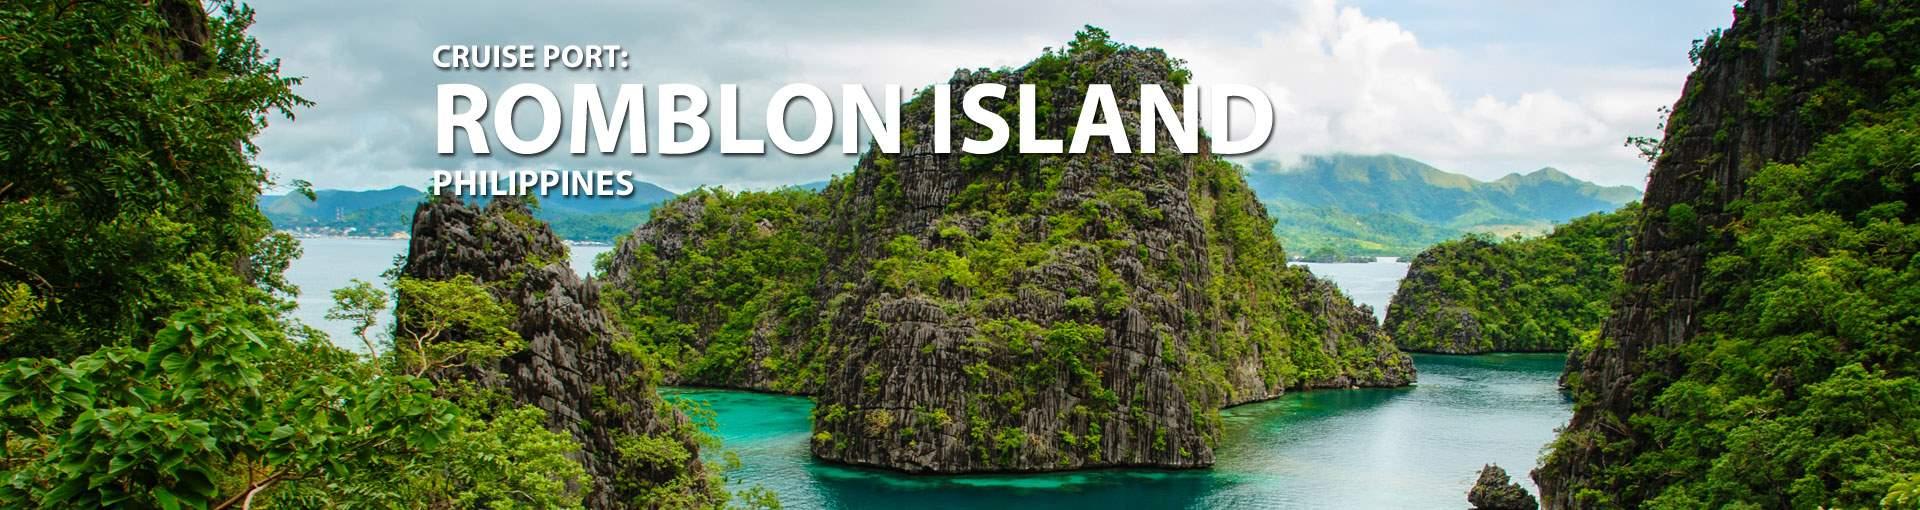 Cruises to Romblon Island, Philippines